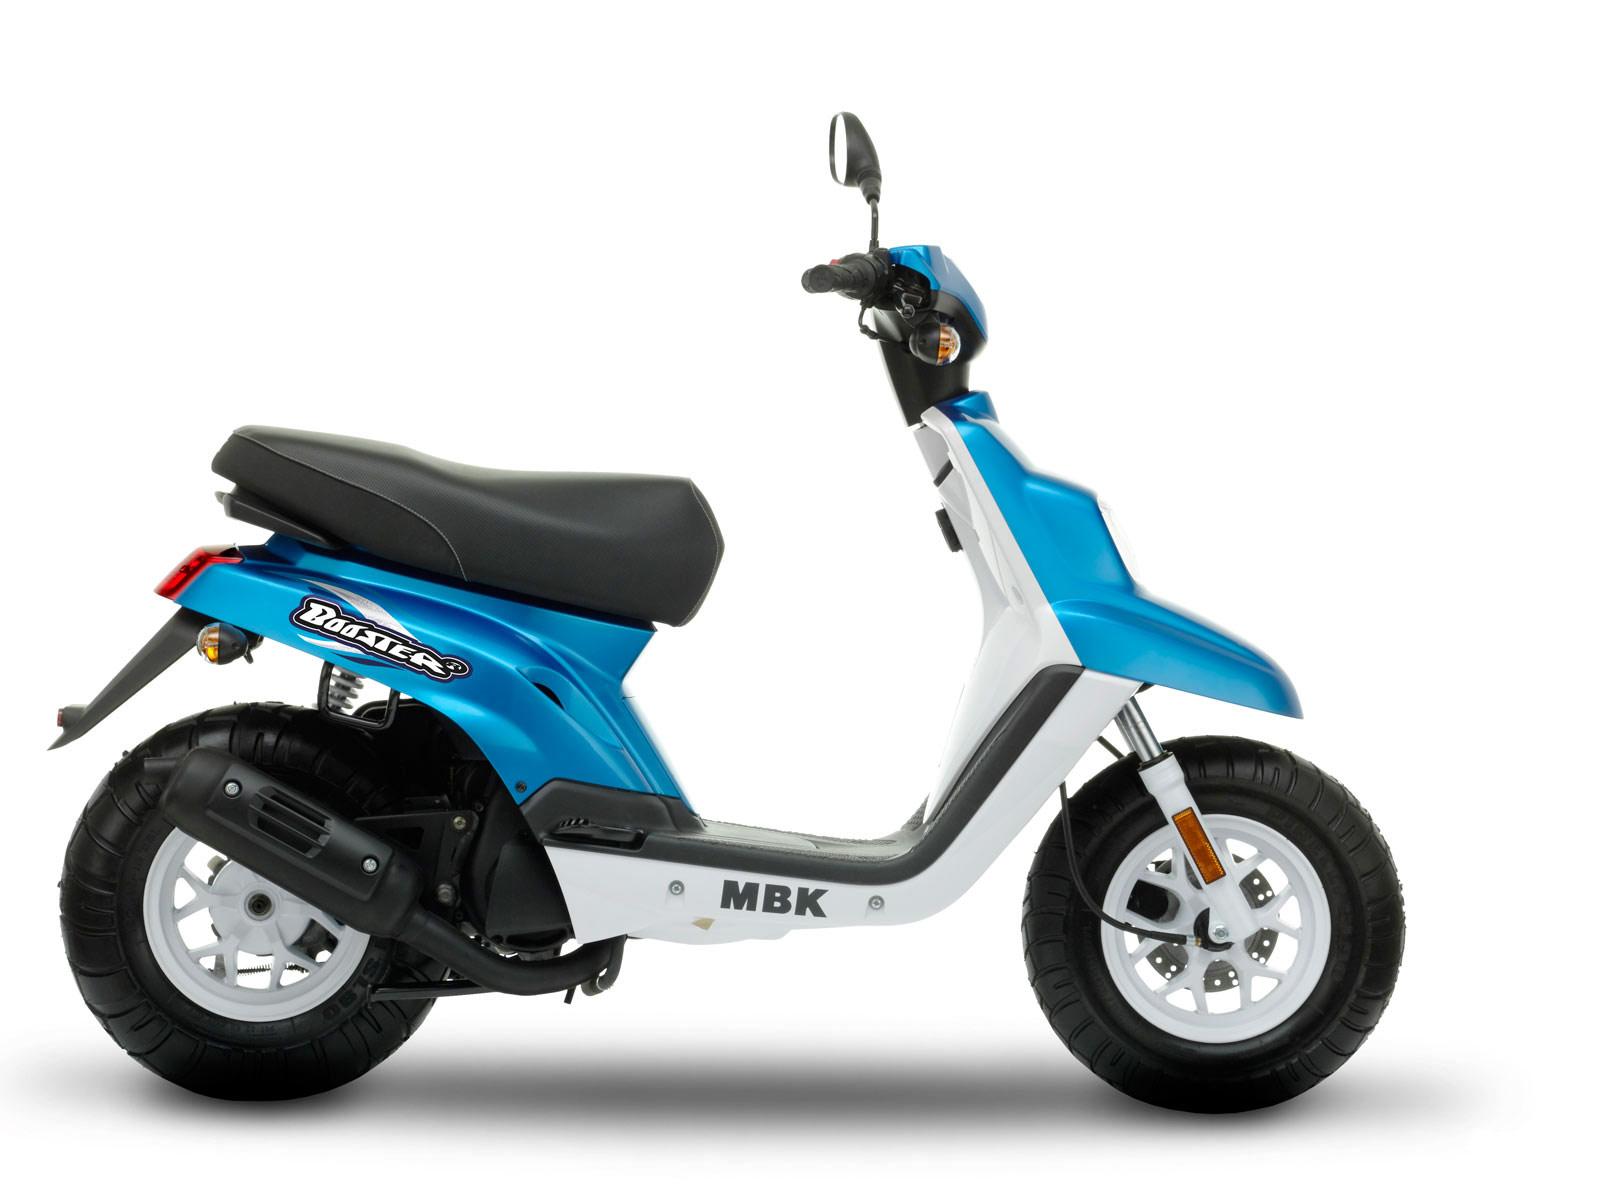 2010 mbk booster scooter pictures. Black Bedroom Furniture Sets. Home Design Ideas